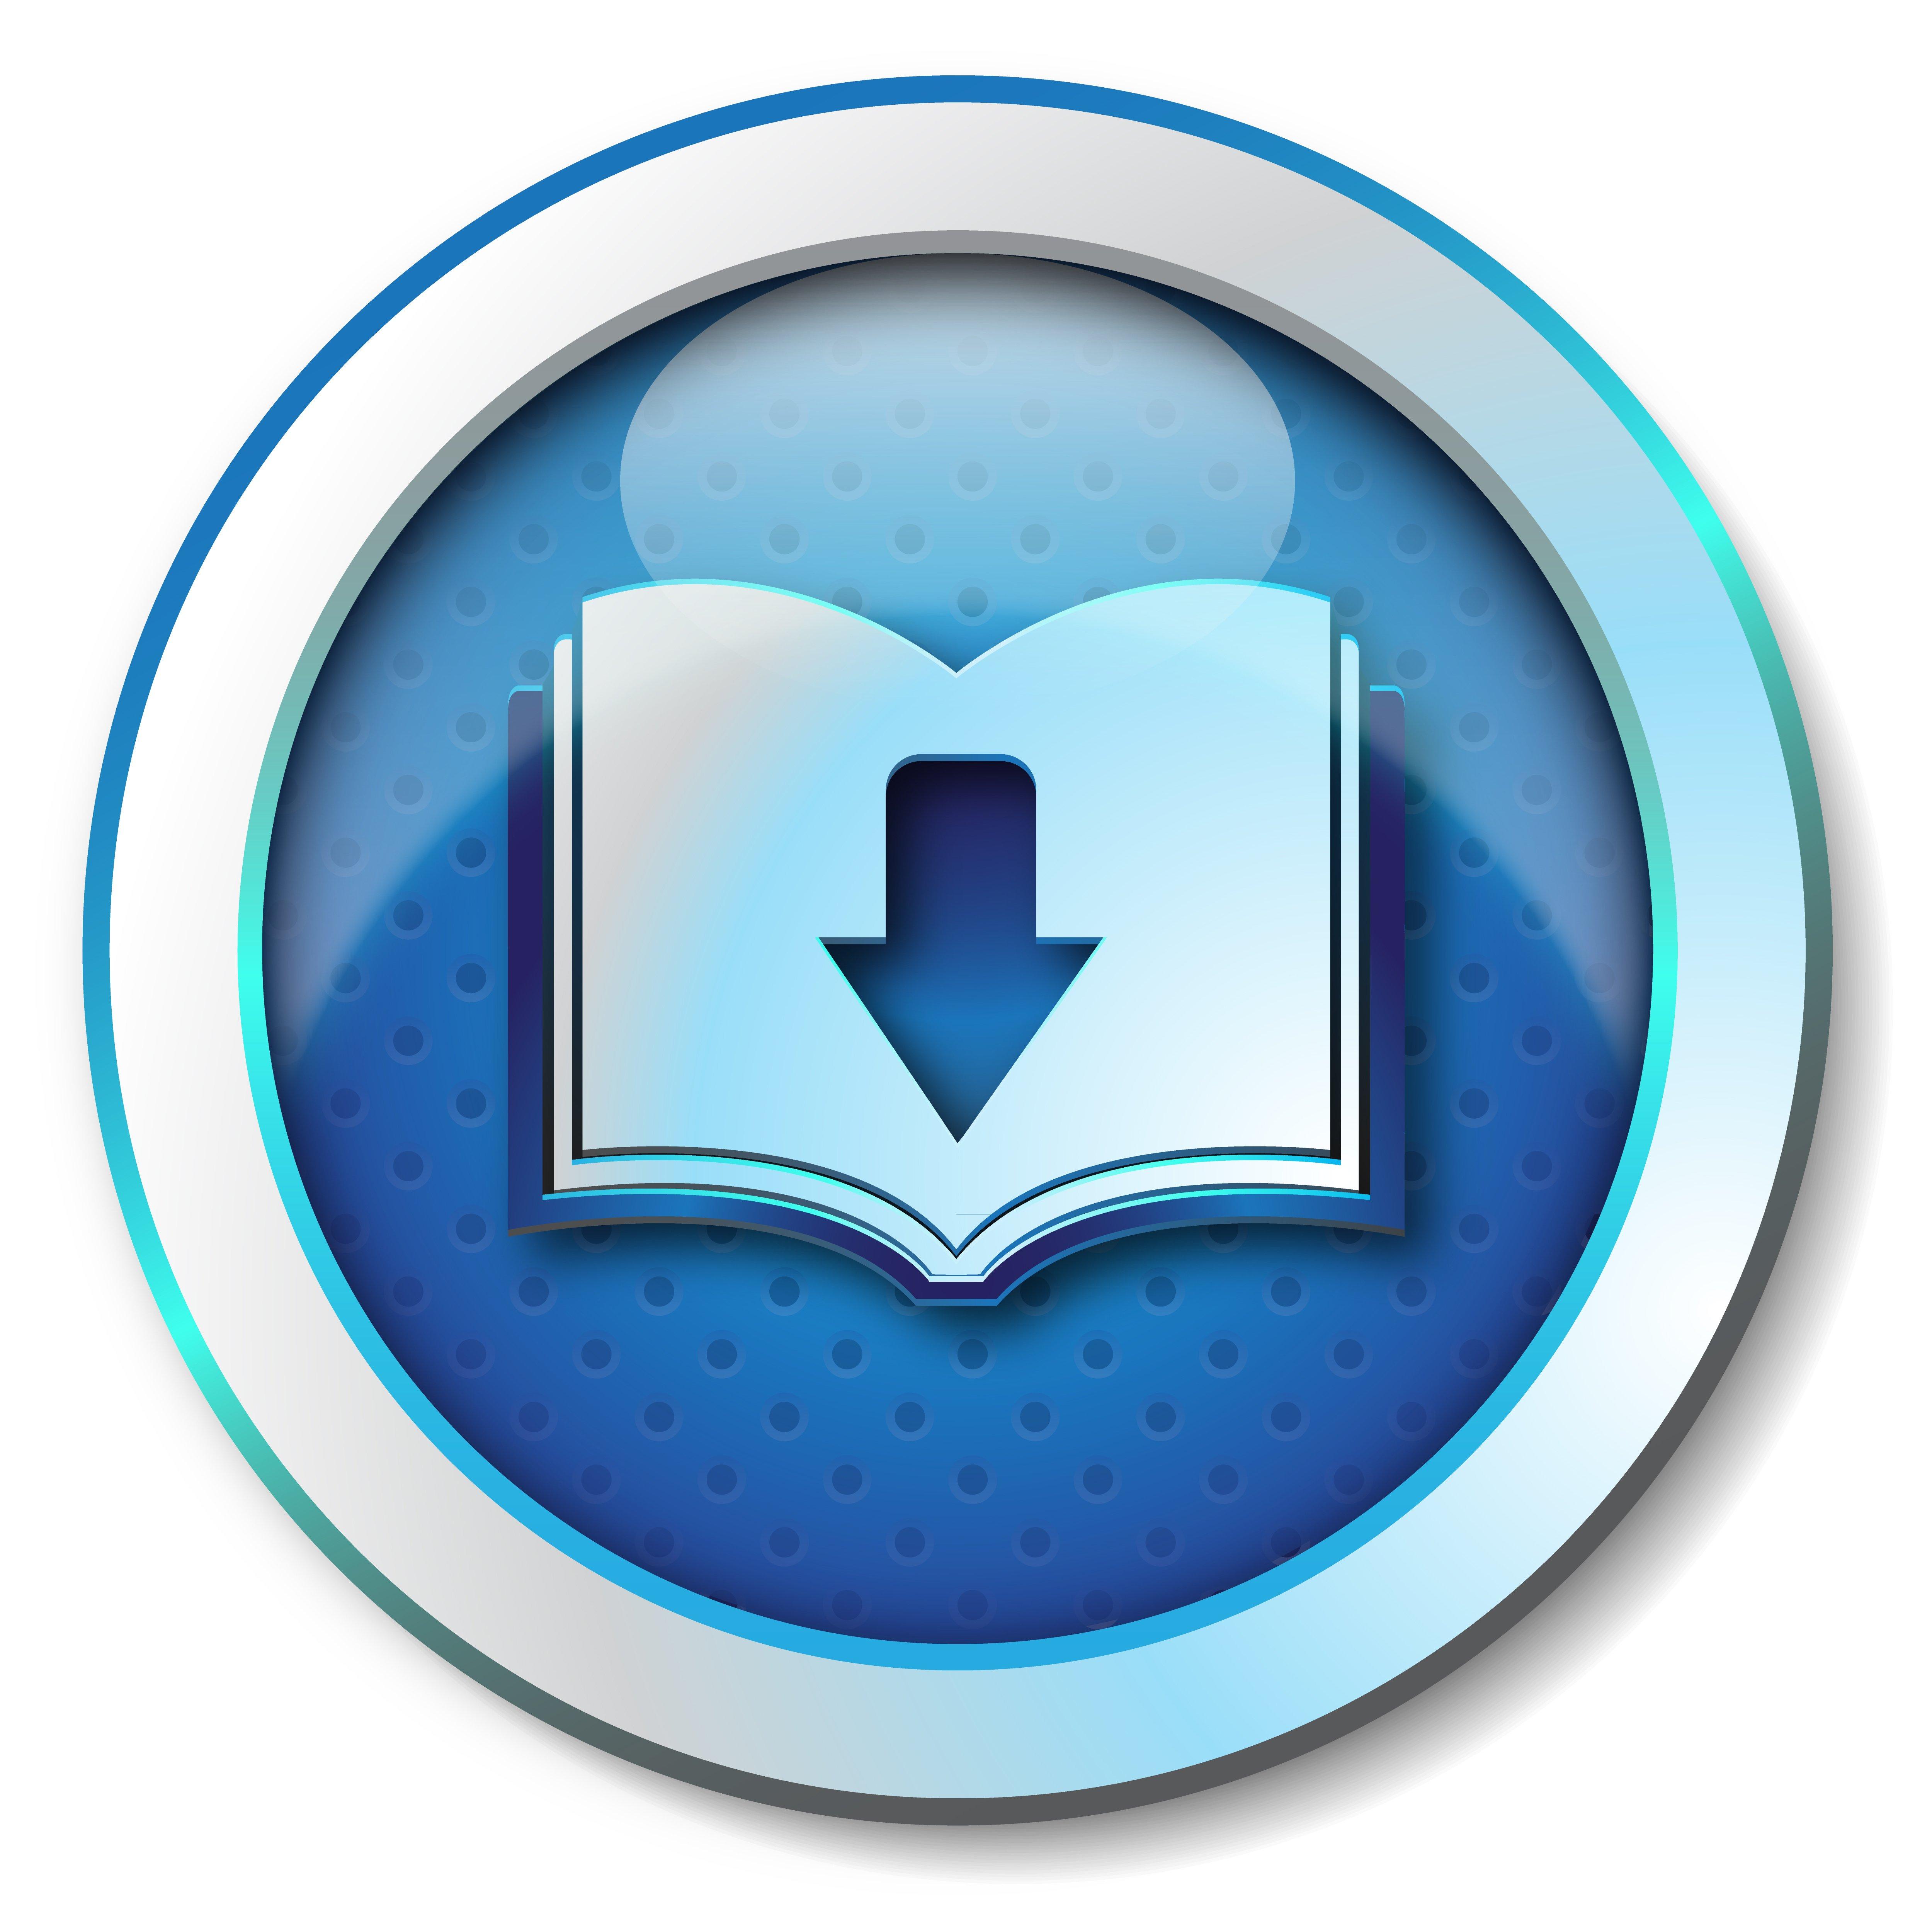 Free_Book_Download_blue_arrow